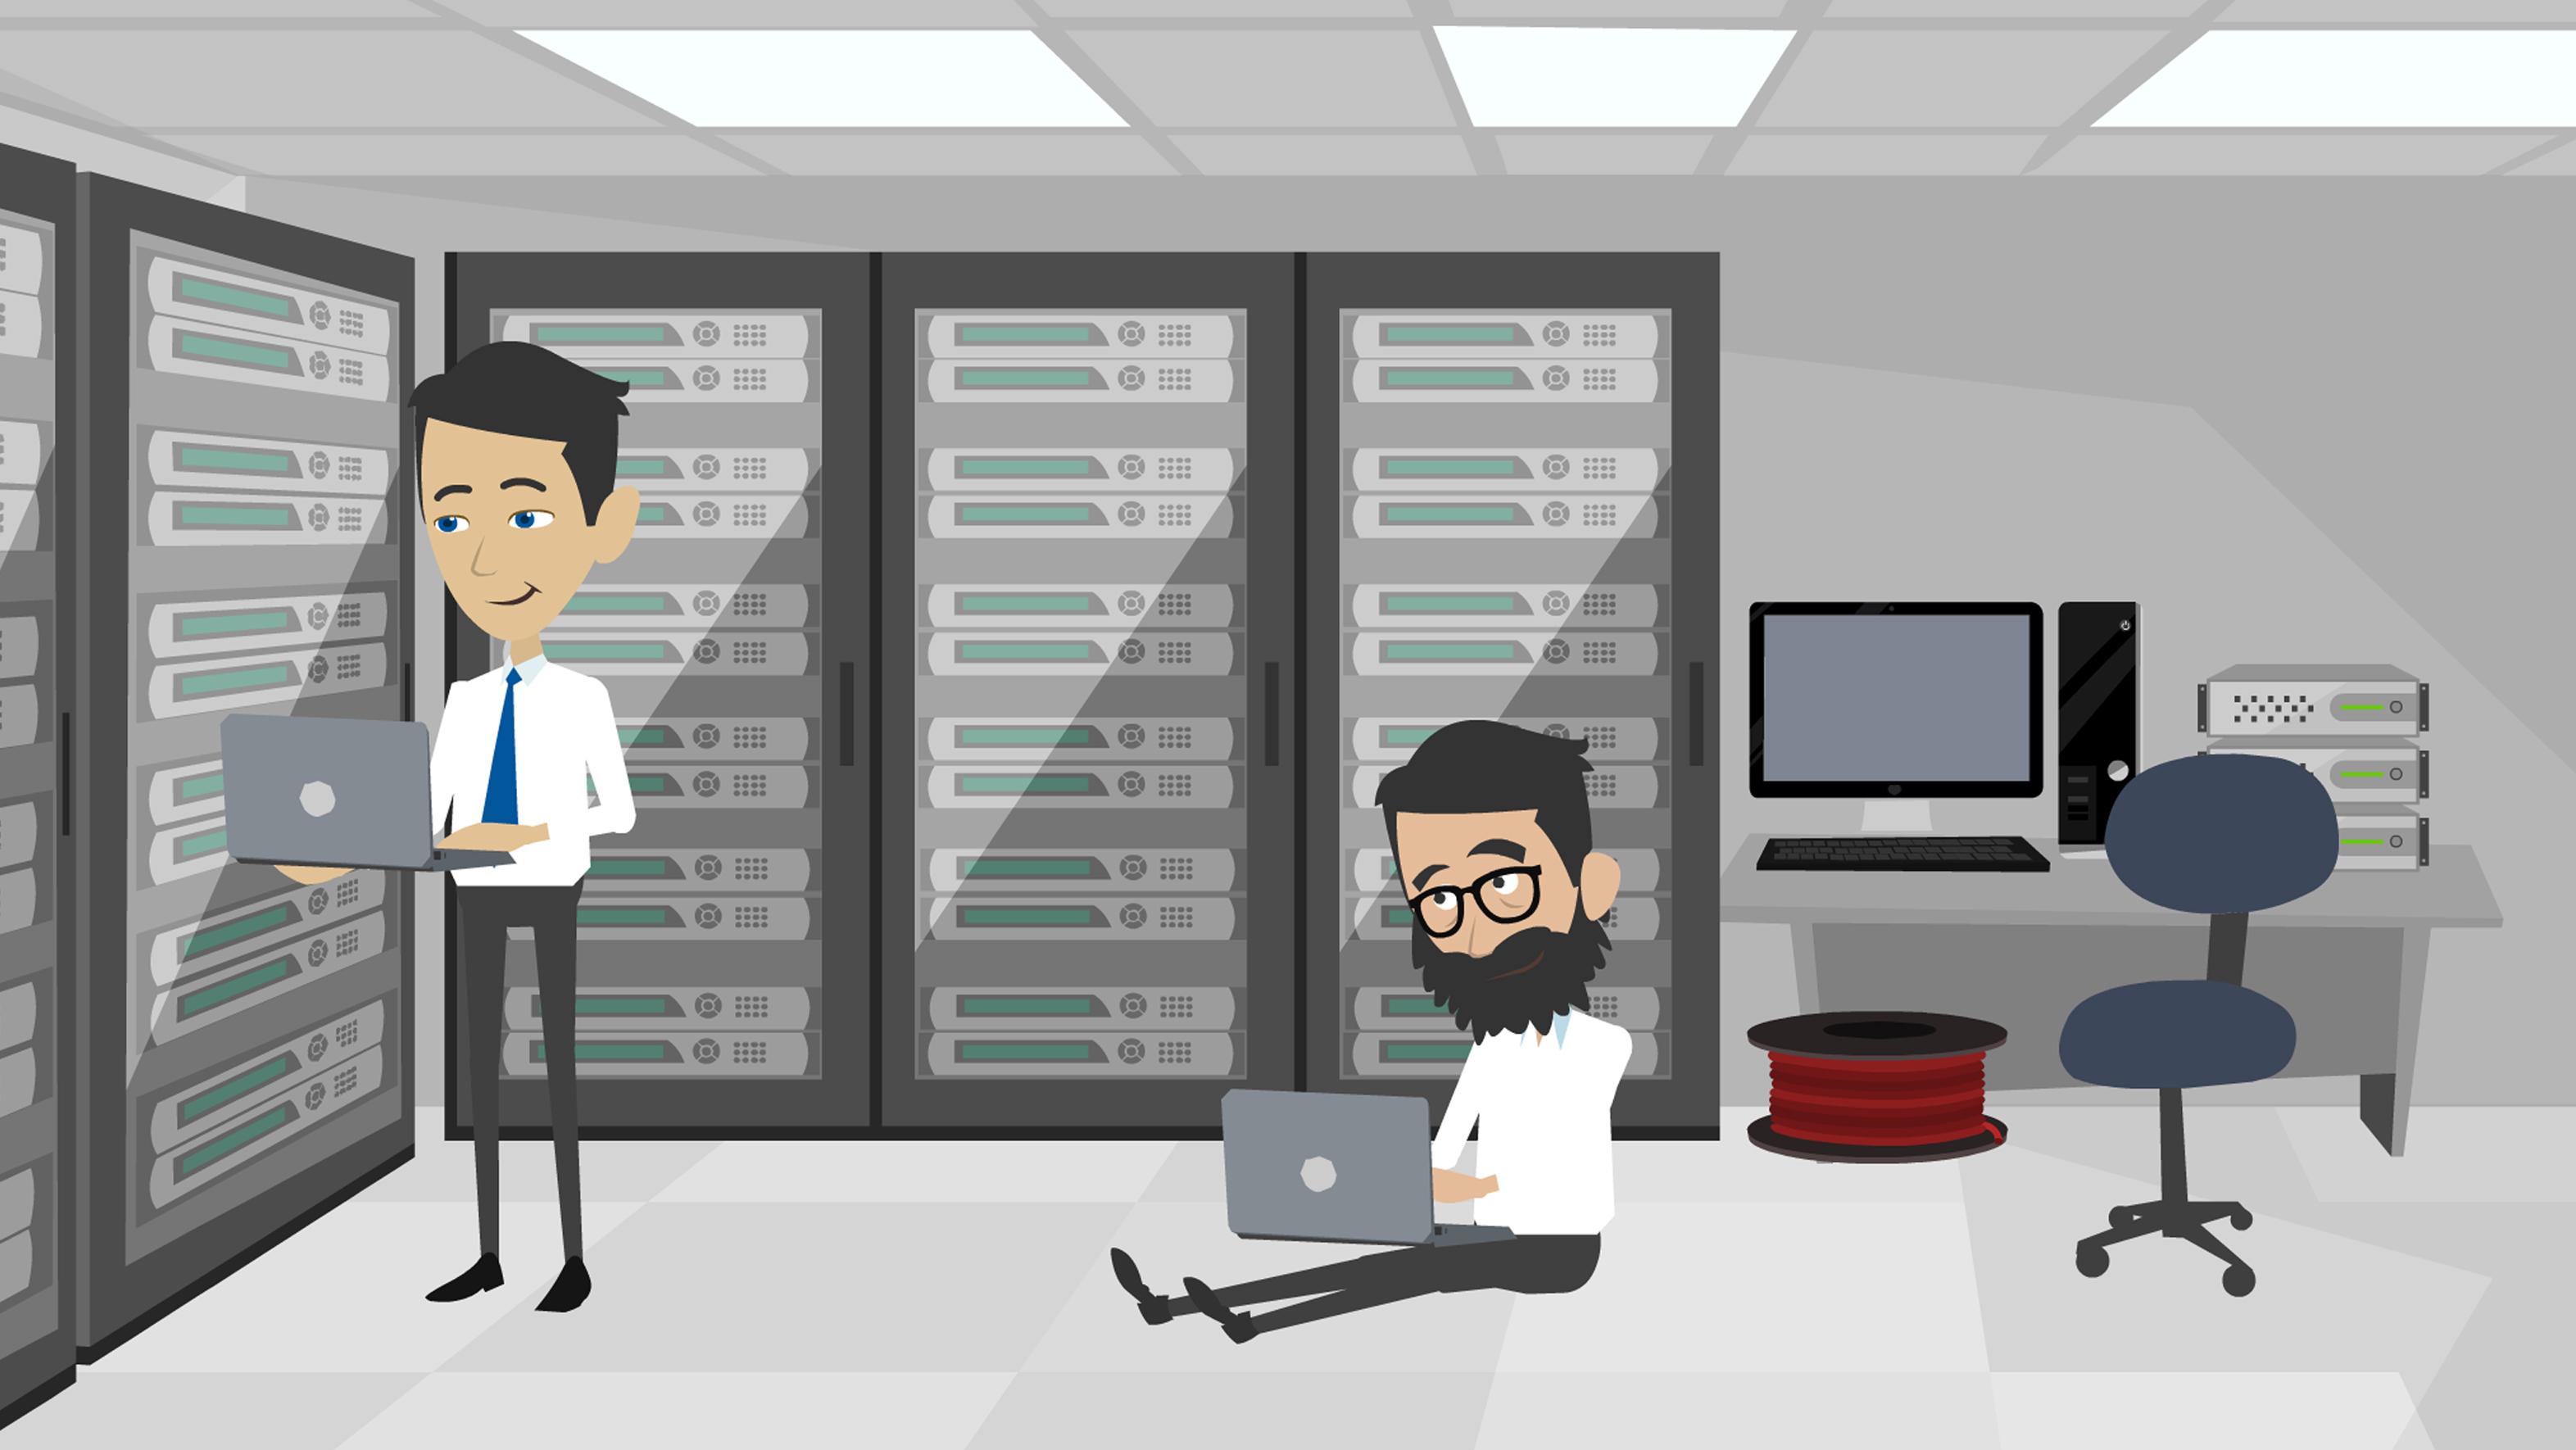 mark derho oleg sunko tech savvy nyc server room animated 2017